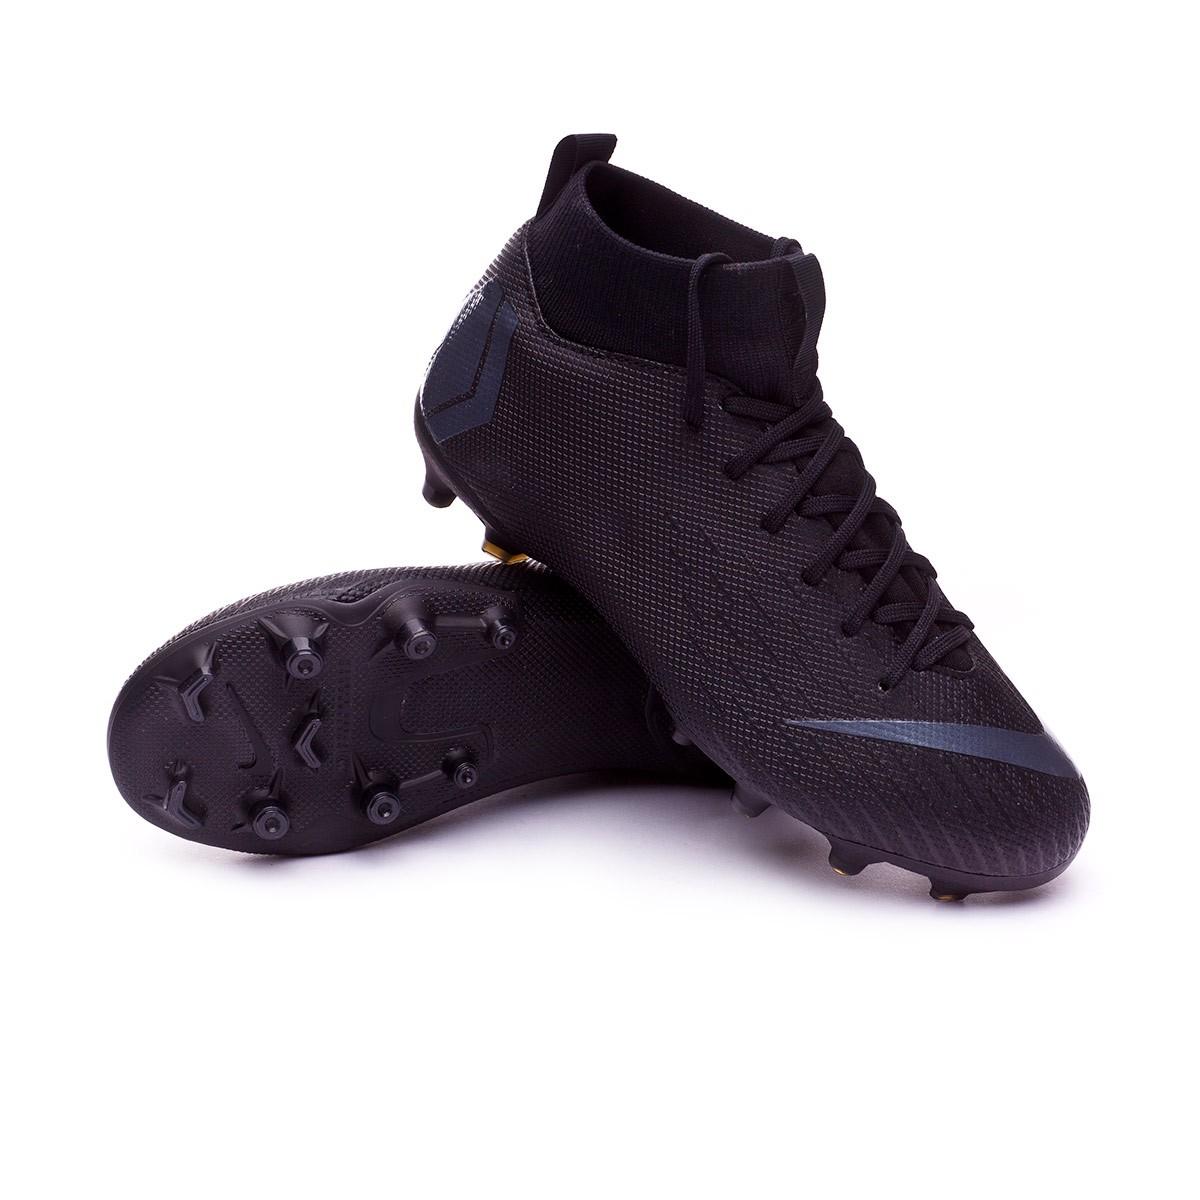 ad4c75f08 Football Boots Nike Kids Mercurial Superfly VI Academy GS MG Black ...